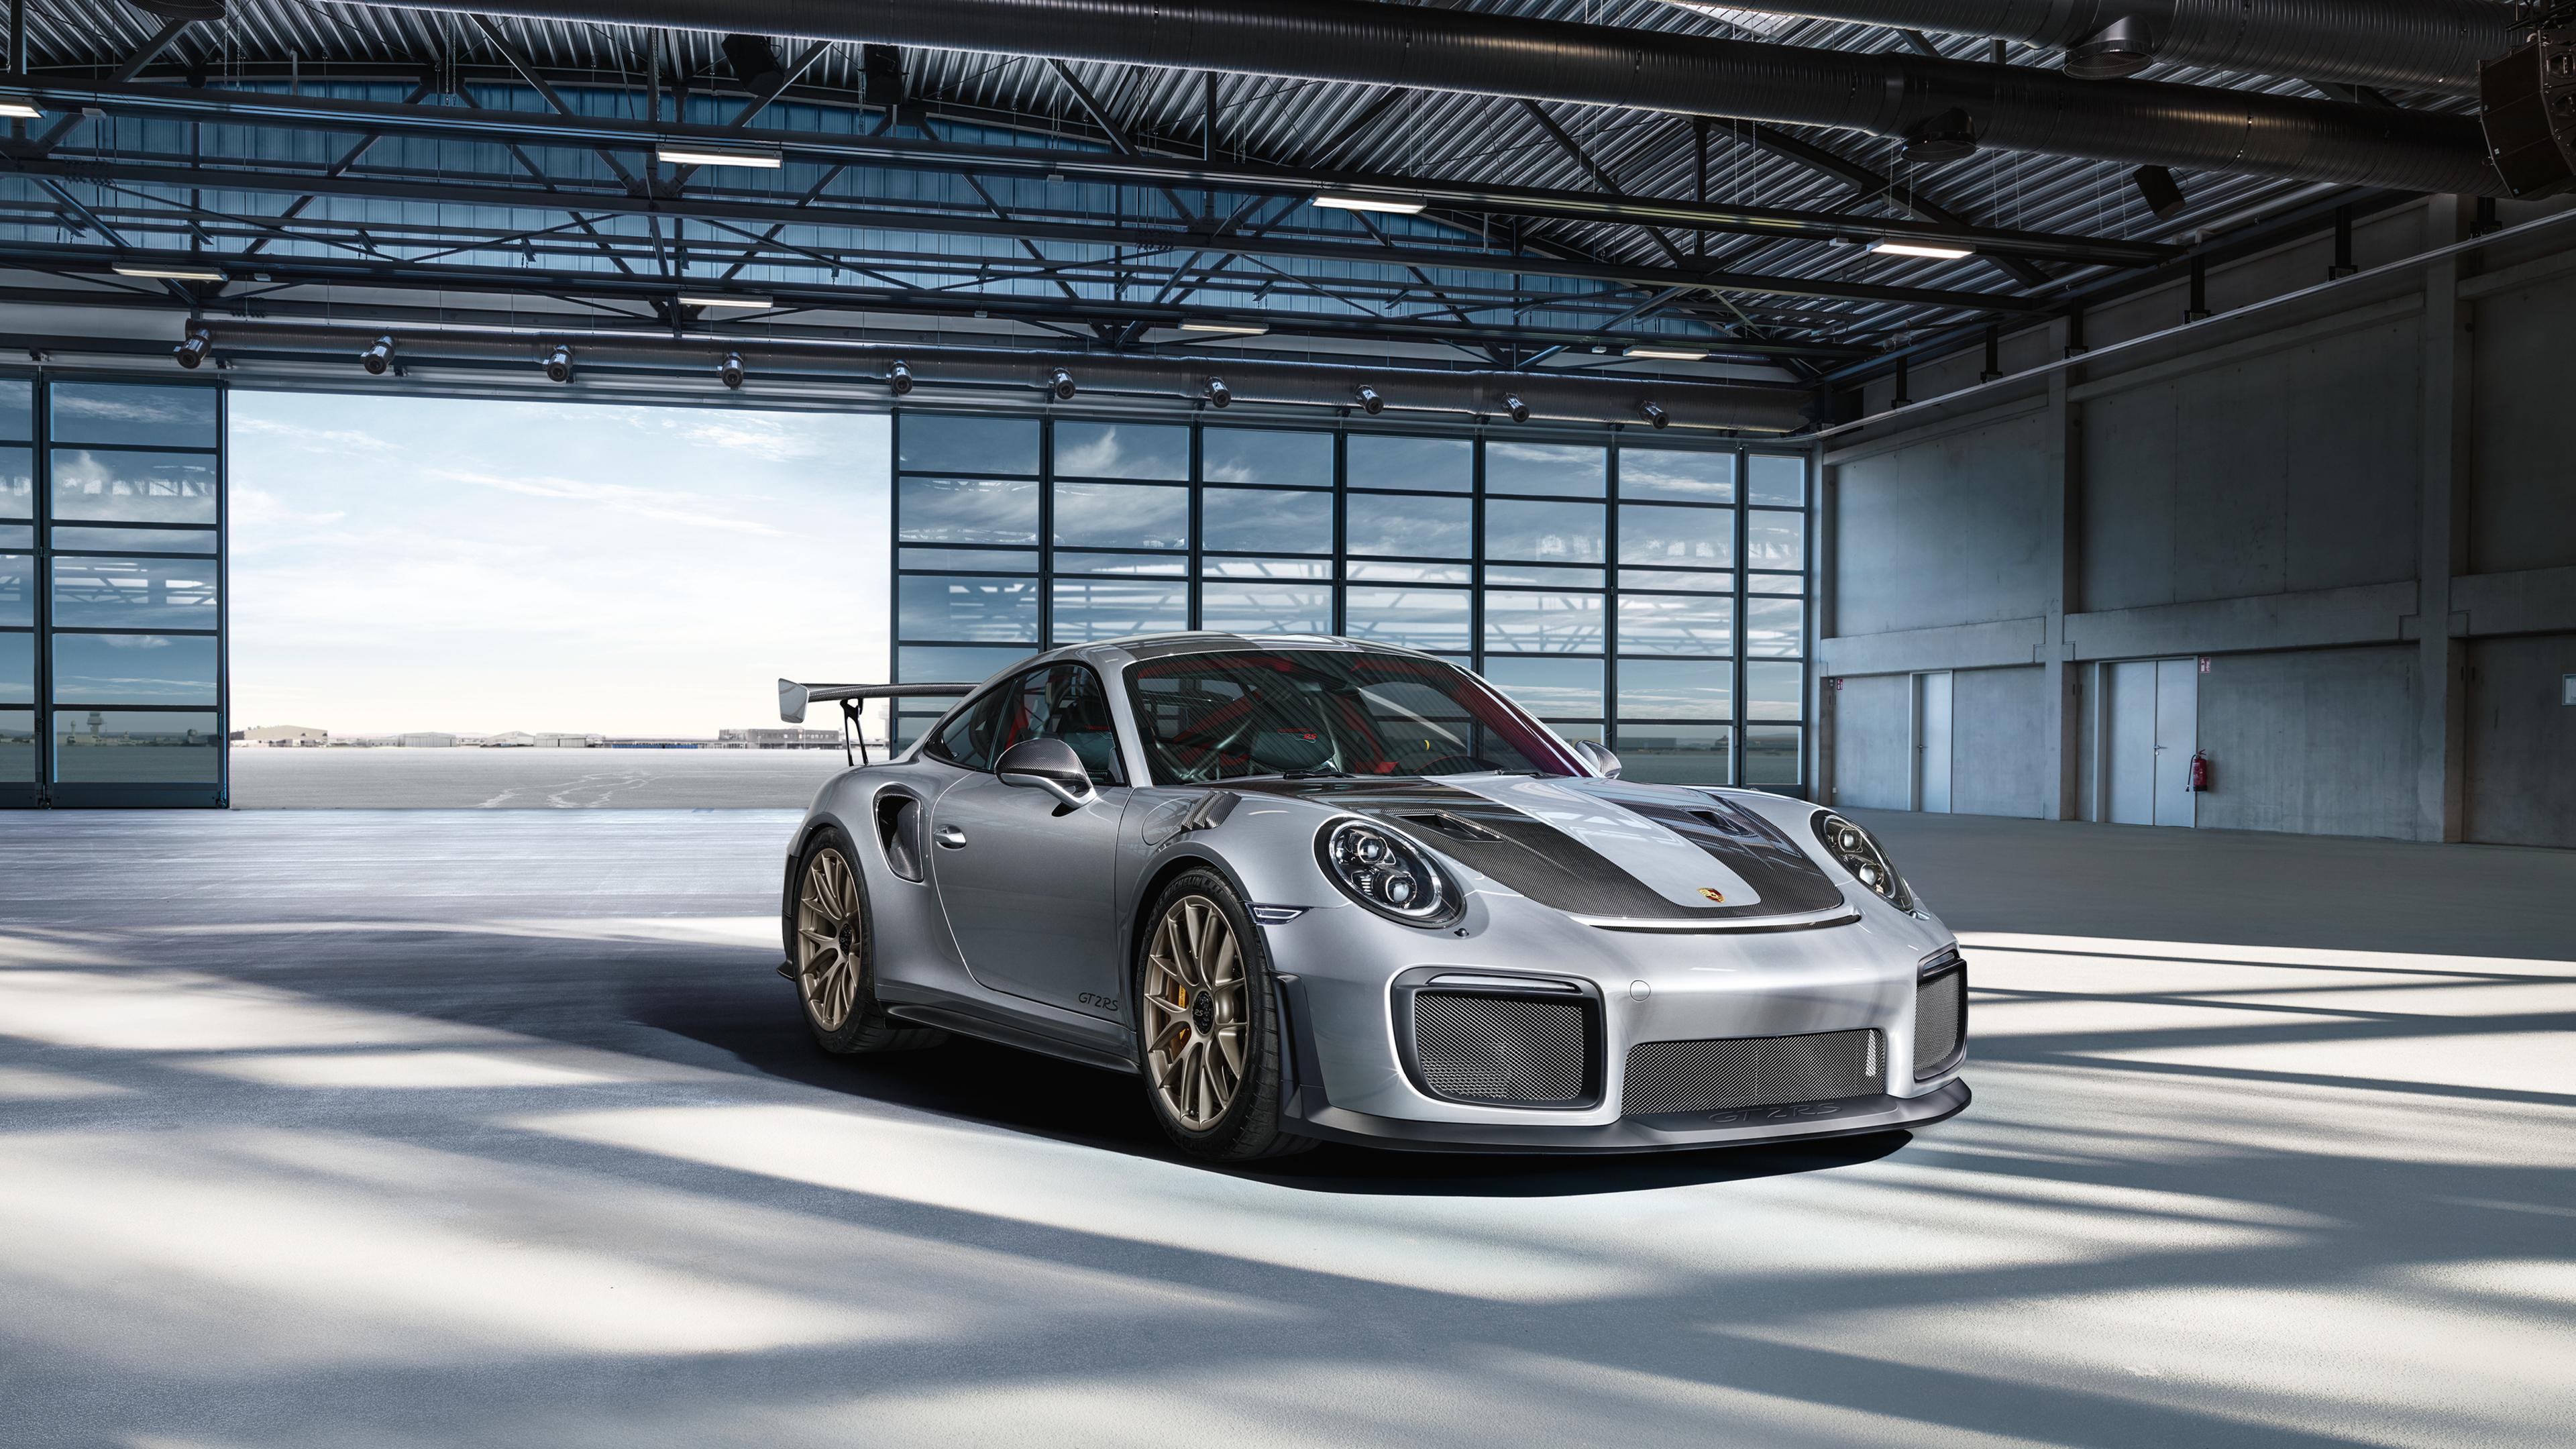 2019 porsche 911 gt2 rs 1569189437 - 2019 Porsche 911 GT2 RS - porsche wallpapers, porsche 911 wallpapers, porsche 911 gt2 r wallpapers, hd-wallpapers, cars wallpapers, behance wallpapers, artist wallpapers, 4k-wallpapers, 2019 cars wallpapers